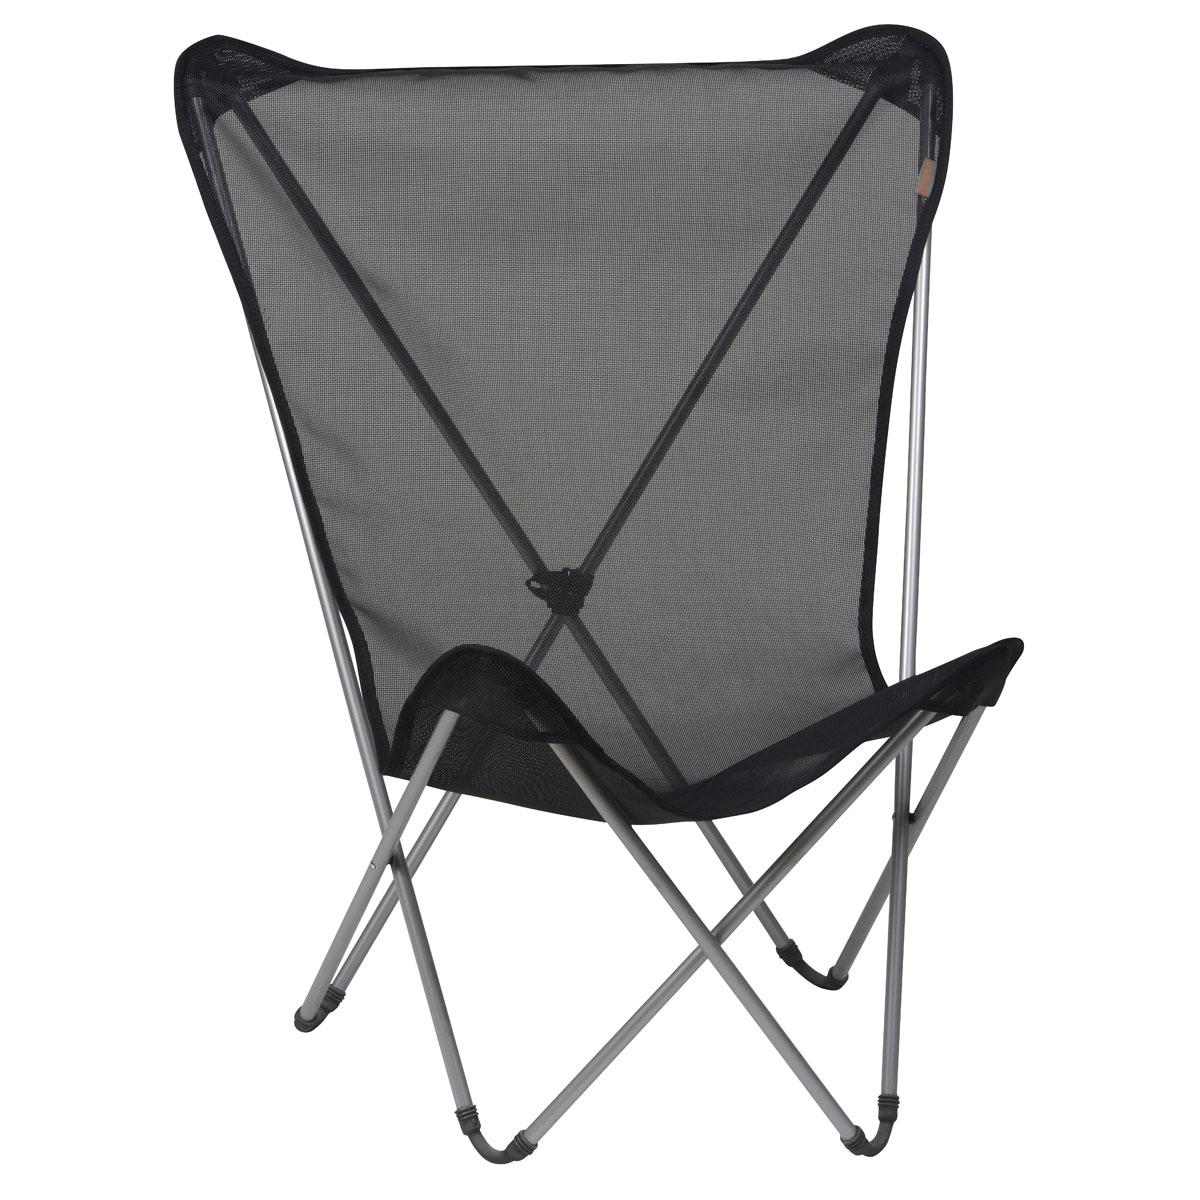 lafuma pop up chairs reclining desk chair staples maxi fauteuil design comparer avec